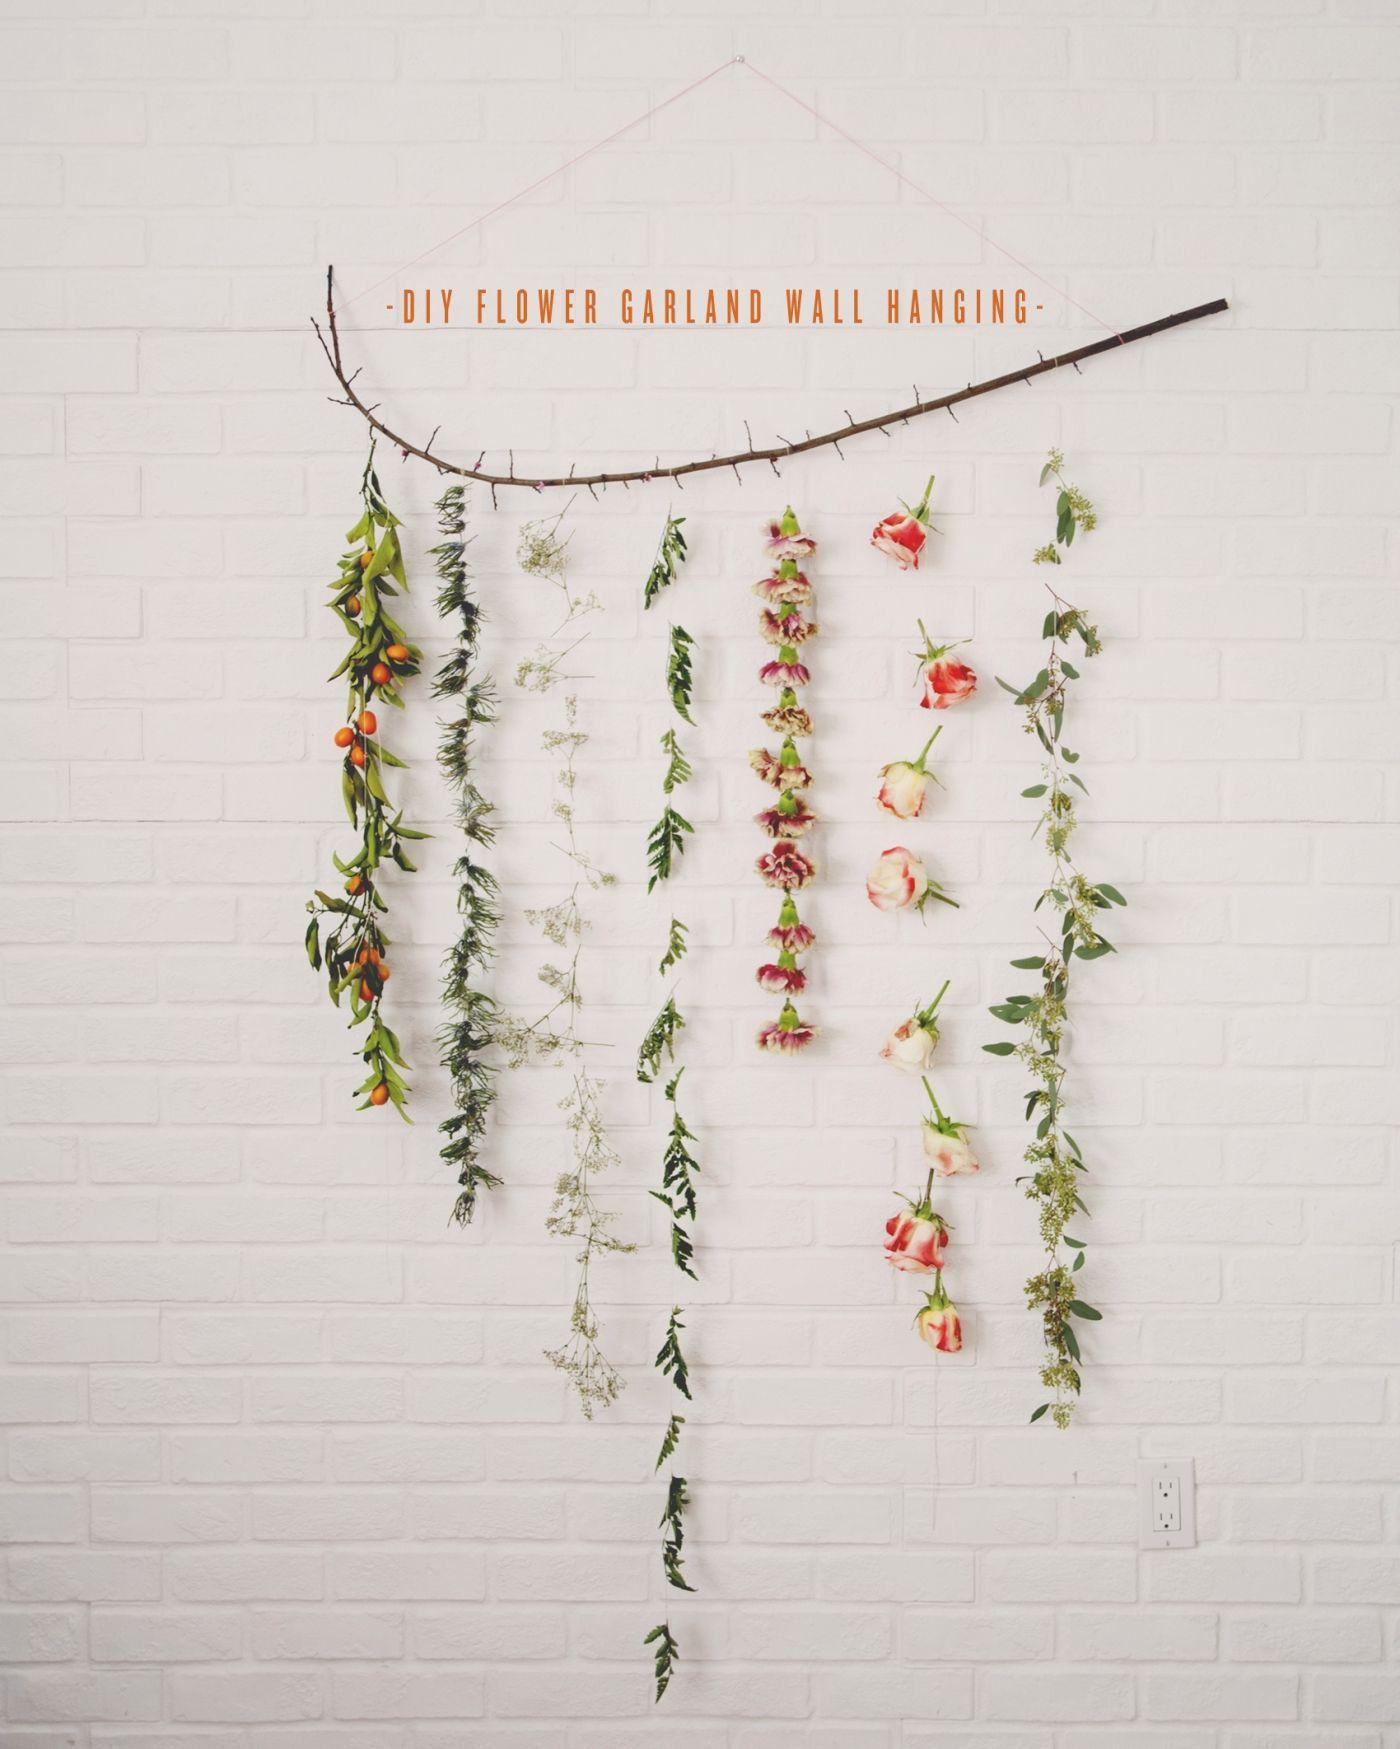 Diy Flower Garland Wall Hanging Diy Garland Diy Flowers